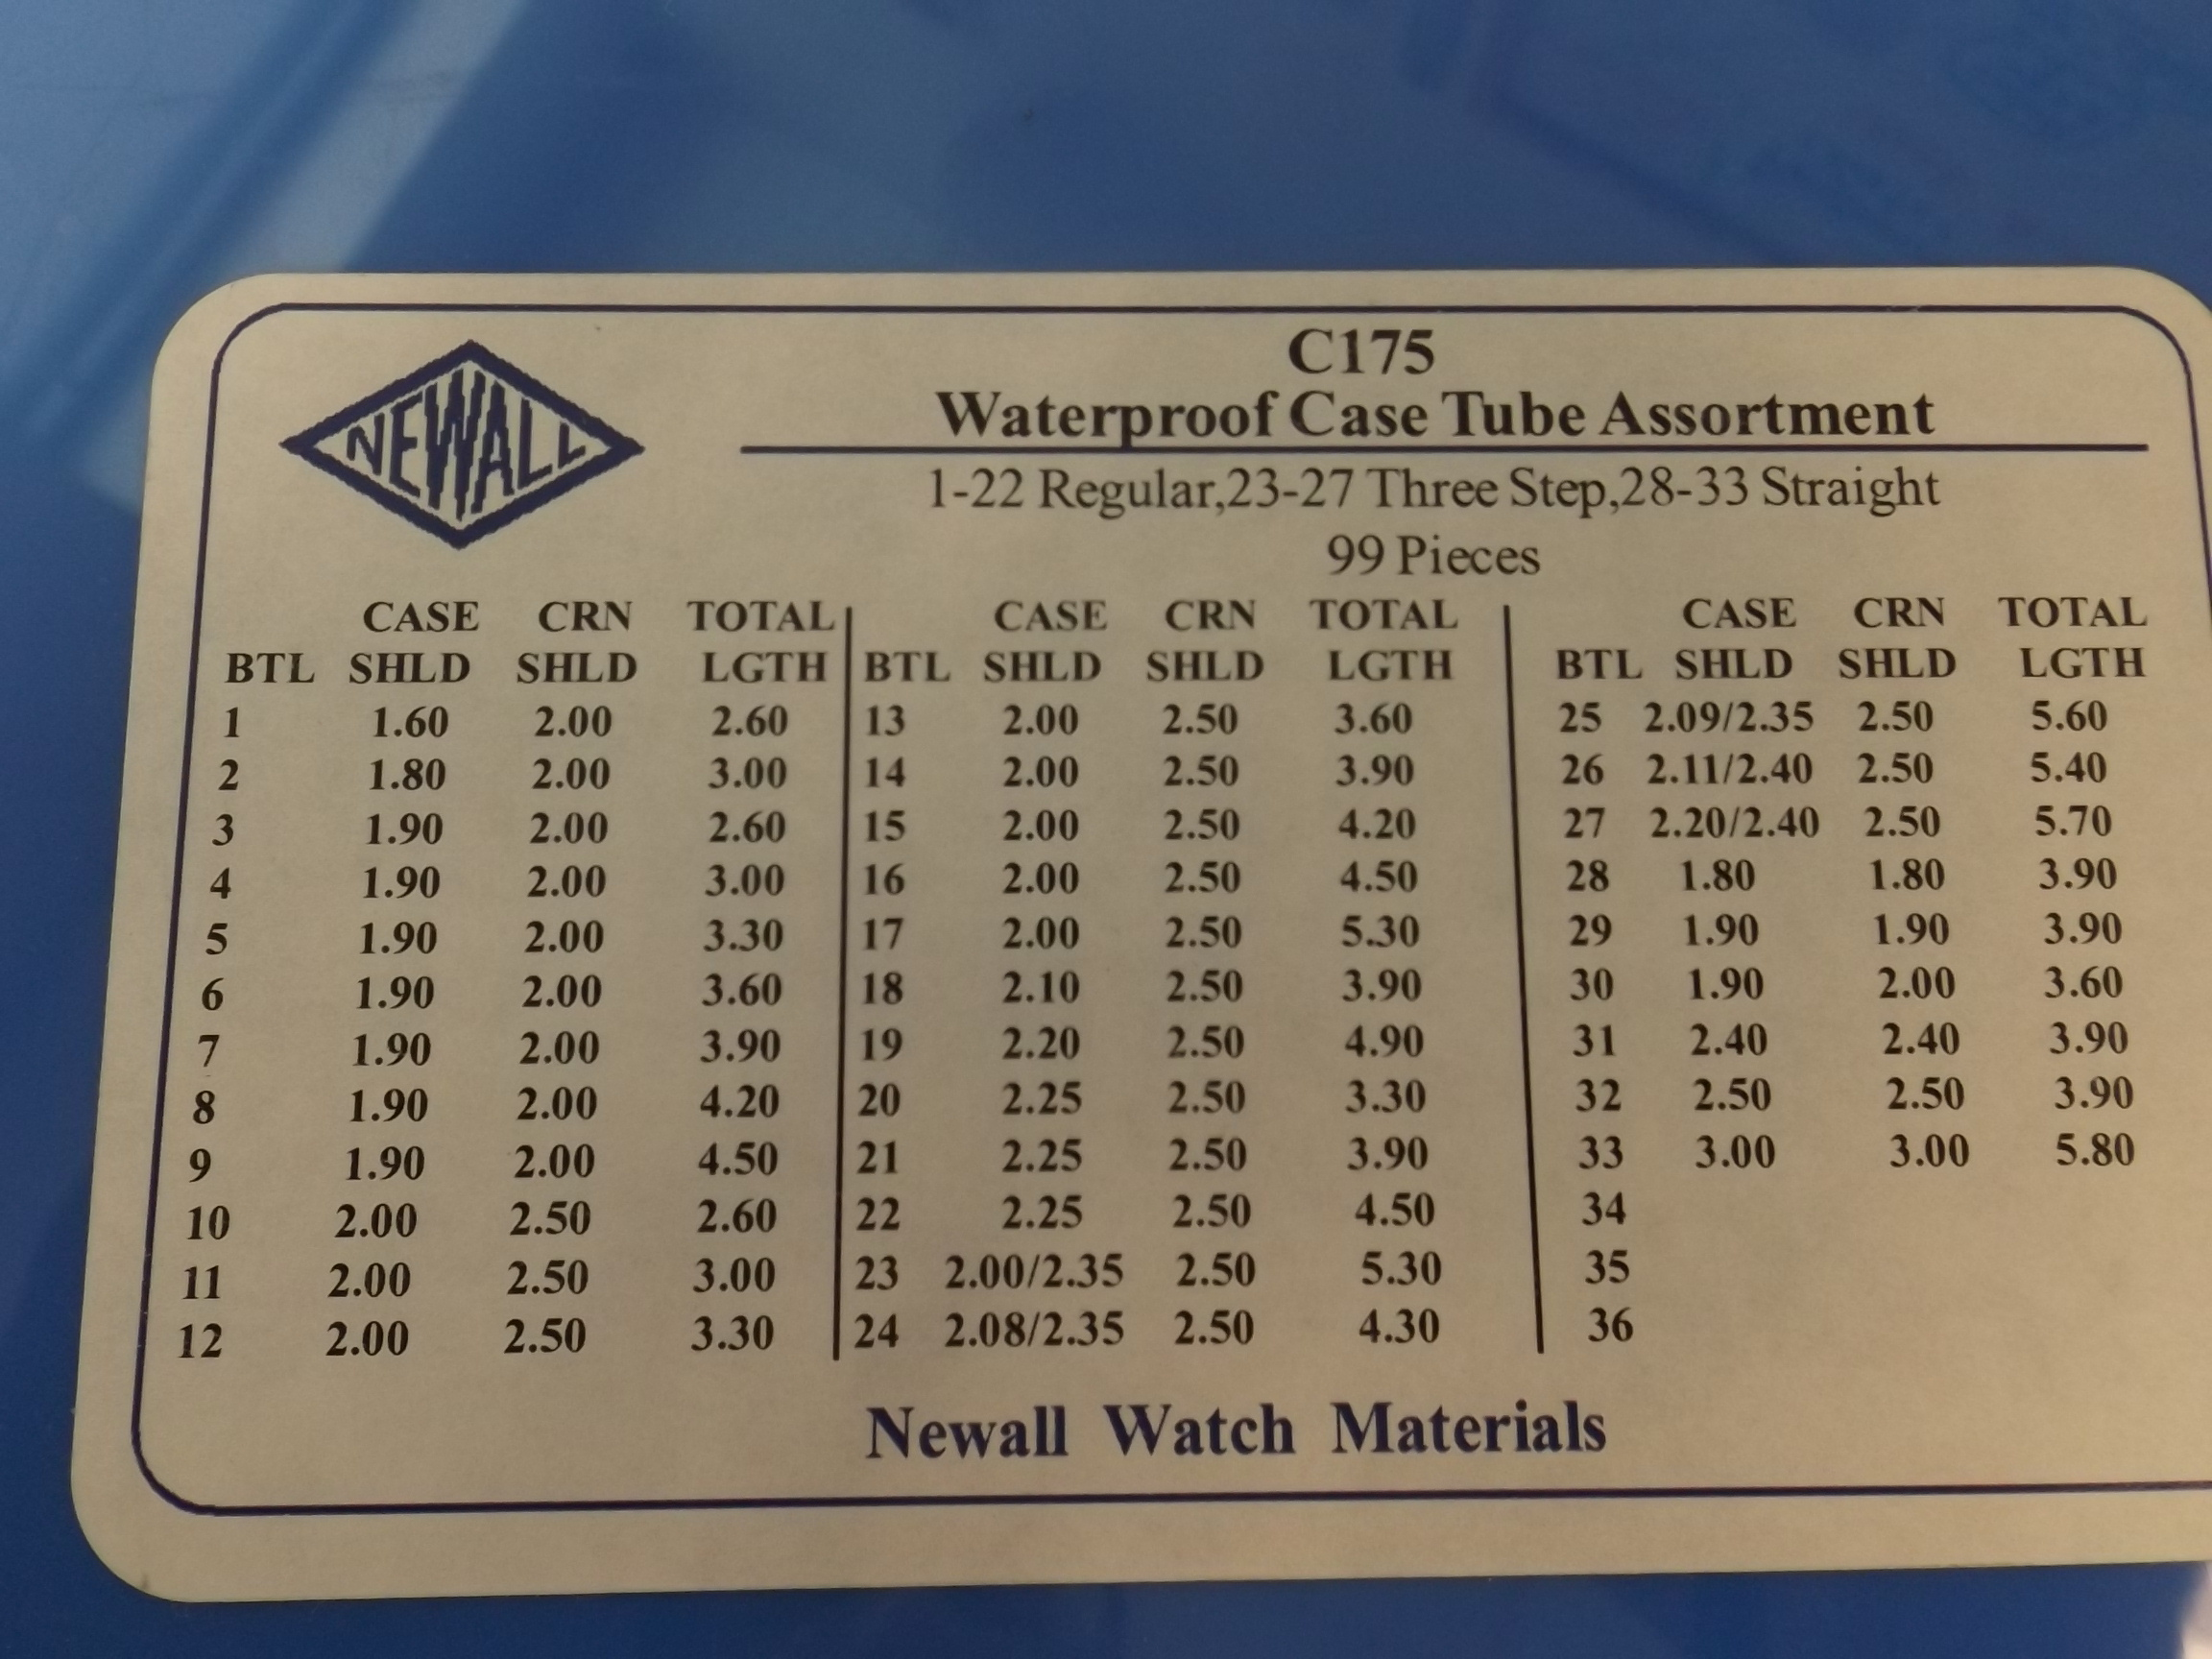 C175 Waterproof Case Tube Assortment-99 Piece-Newall